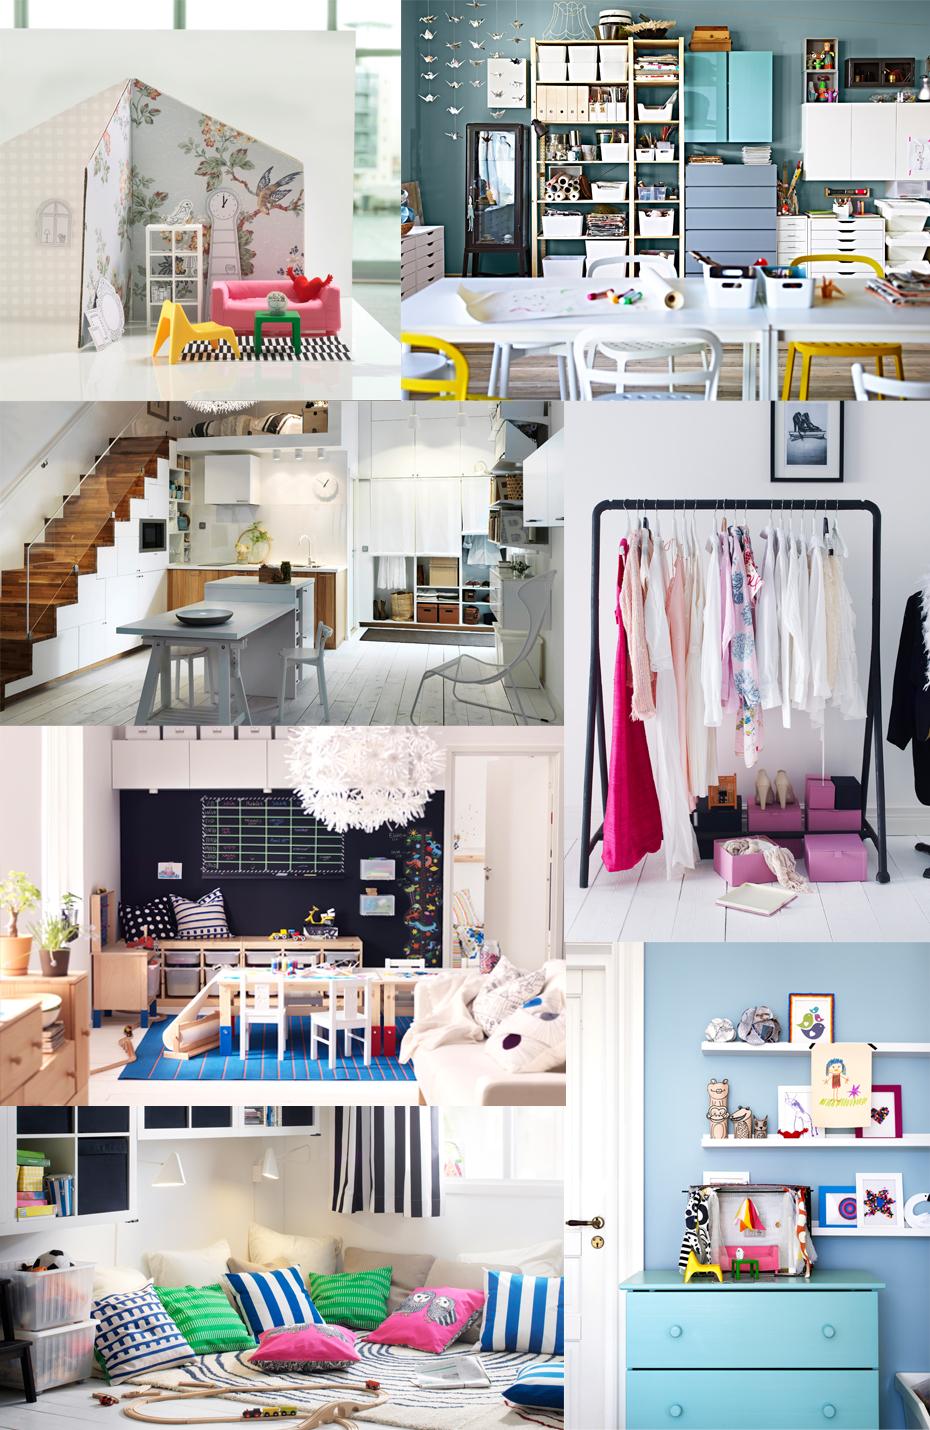 ikea katalog 2014 showroom. Black Bedroom Furniture Sets. Home Design Ideas